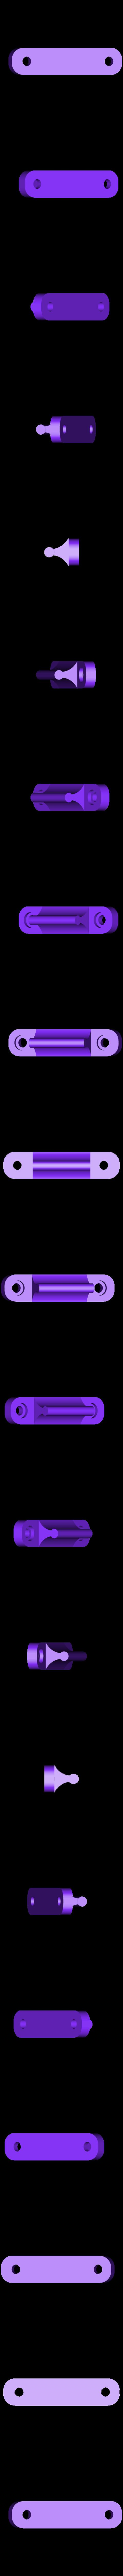 bloc porte cc m.stl Download STL file Camper lock • 3D printing object, bigoudi03